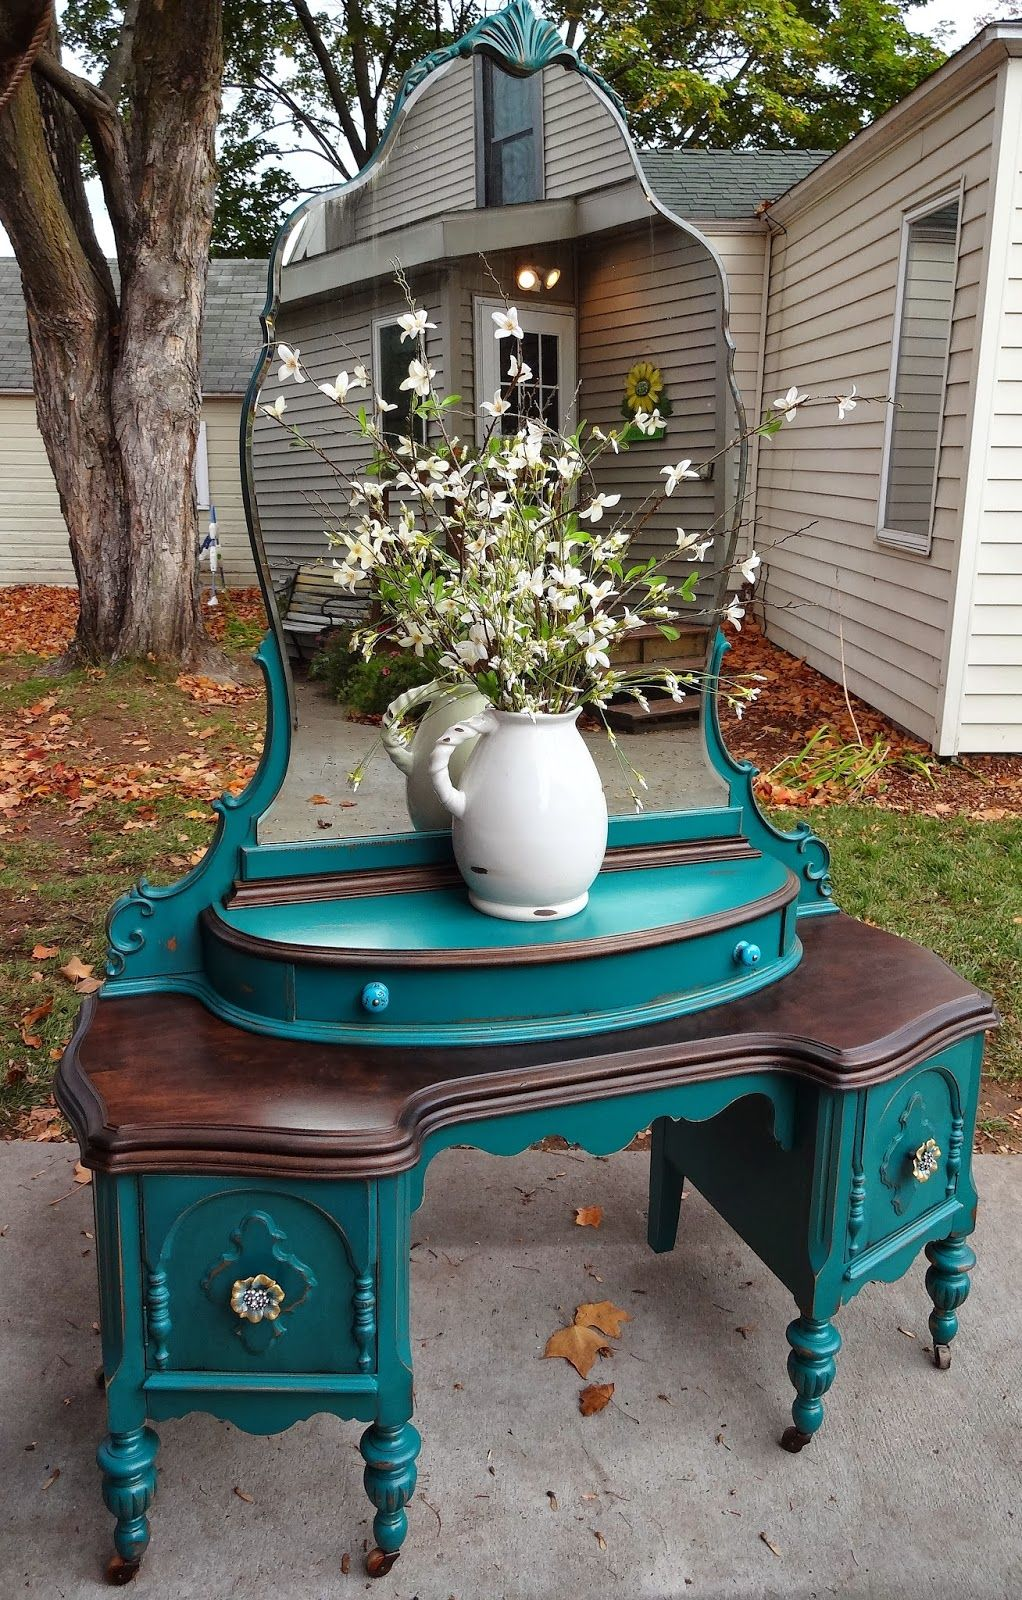 One of few times I like painted antique furniture - DSC01911.JPG 1,022×1,600 Pixels Annie Sloan Pinterest Paint